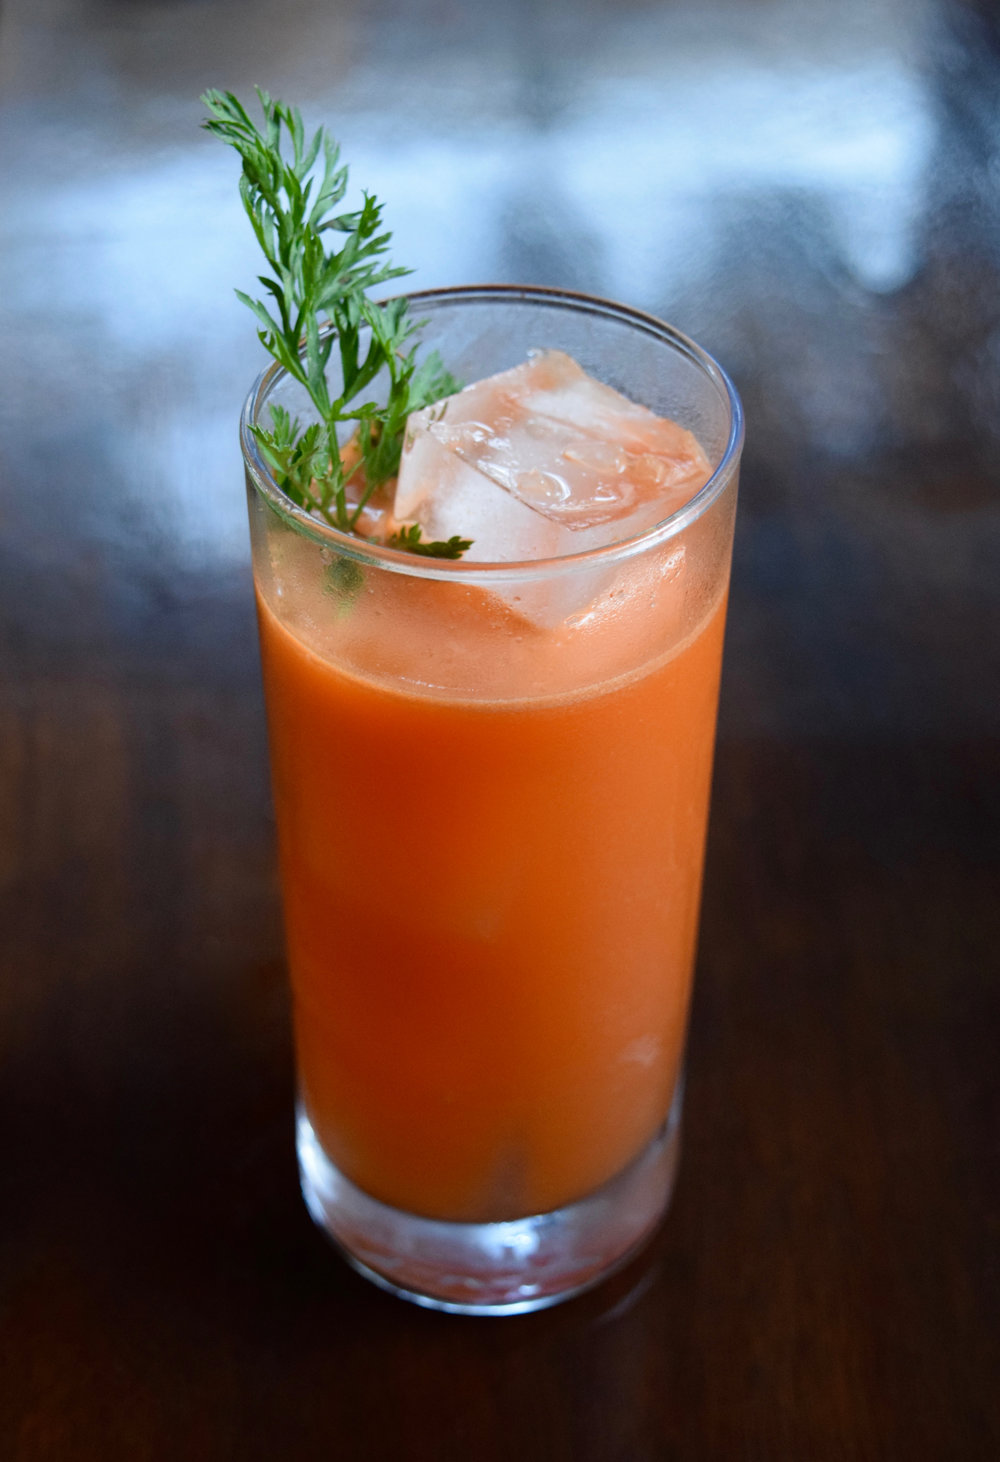 SUPER RABBIT - 1 oz vodka1 oz aquavit1 oz fresh carrot juice3/4 oz fresh lemon juice1/2 oz nostrum pineapple turmeric ginger shrub1/4 oz honey syrupShake with ice and strain.